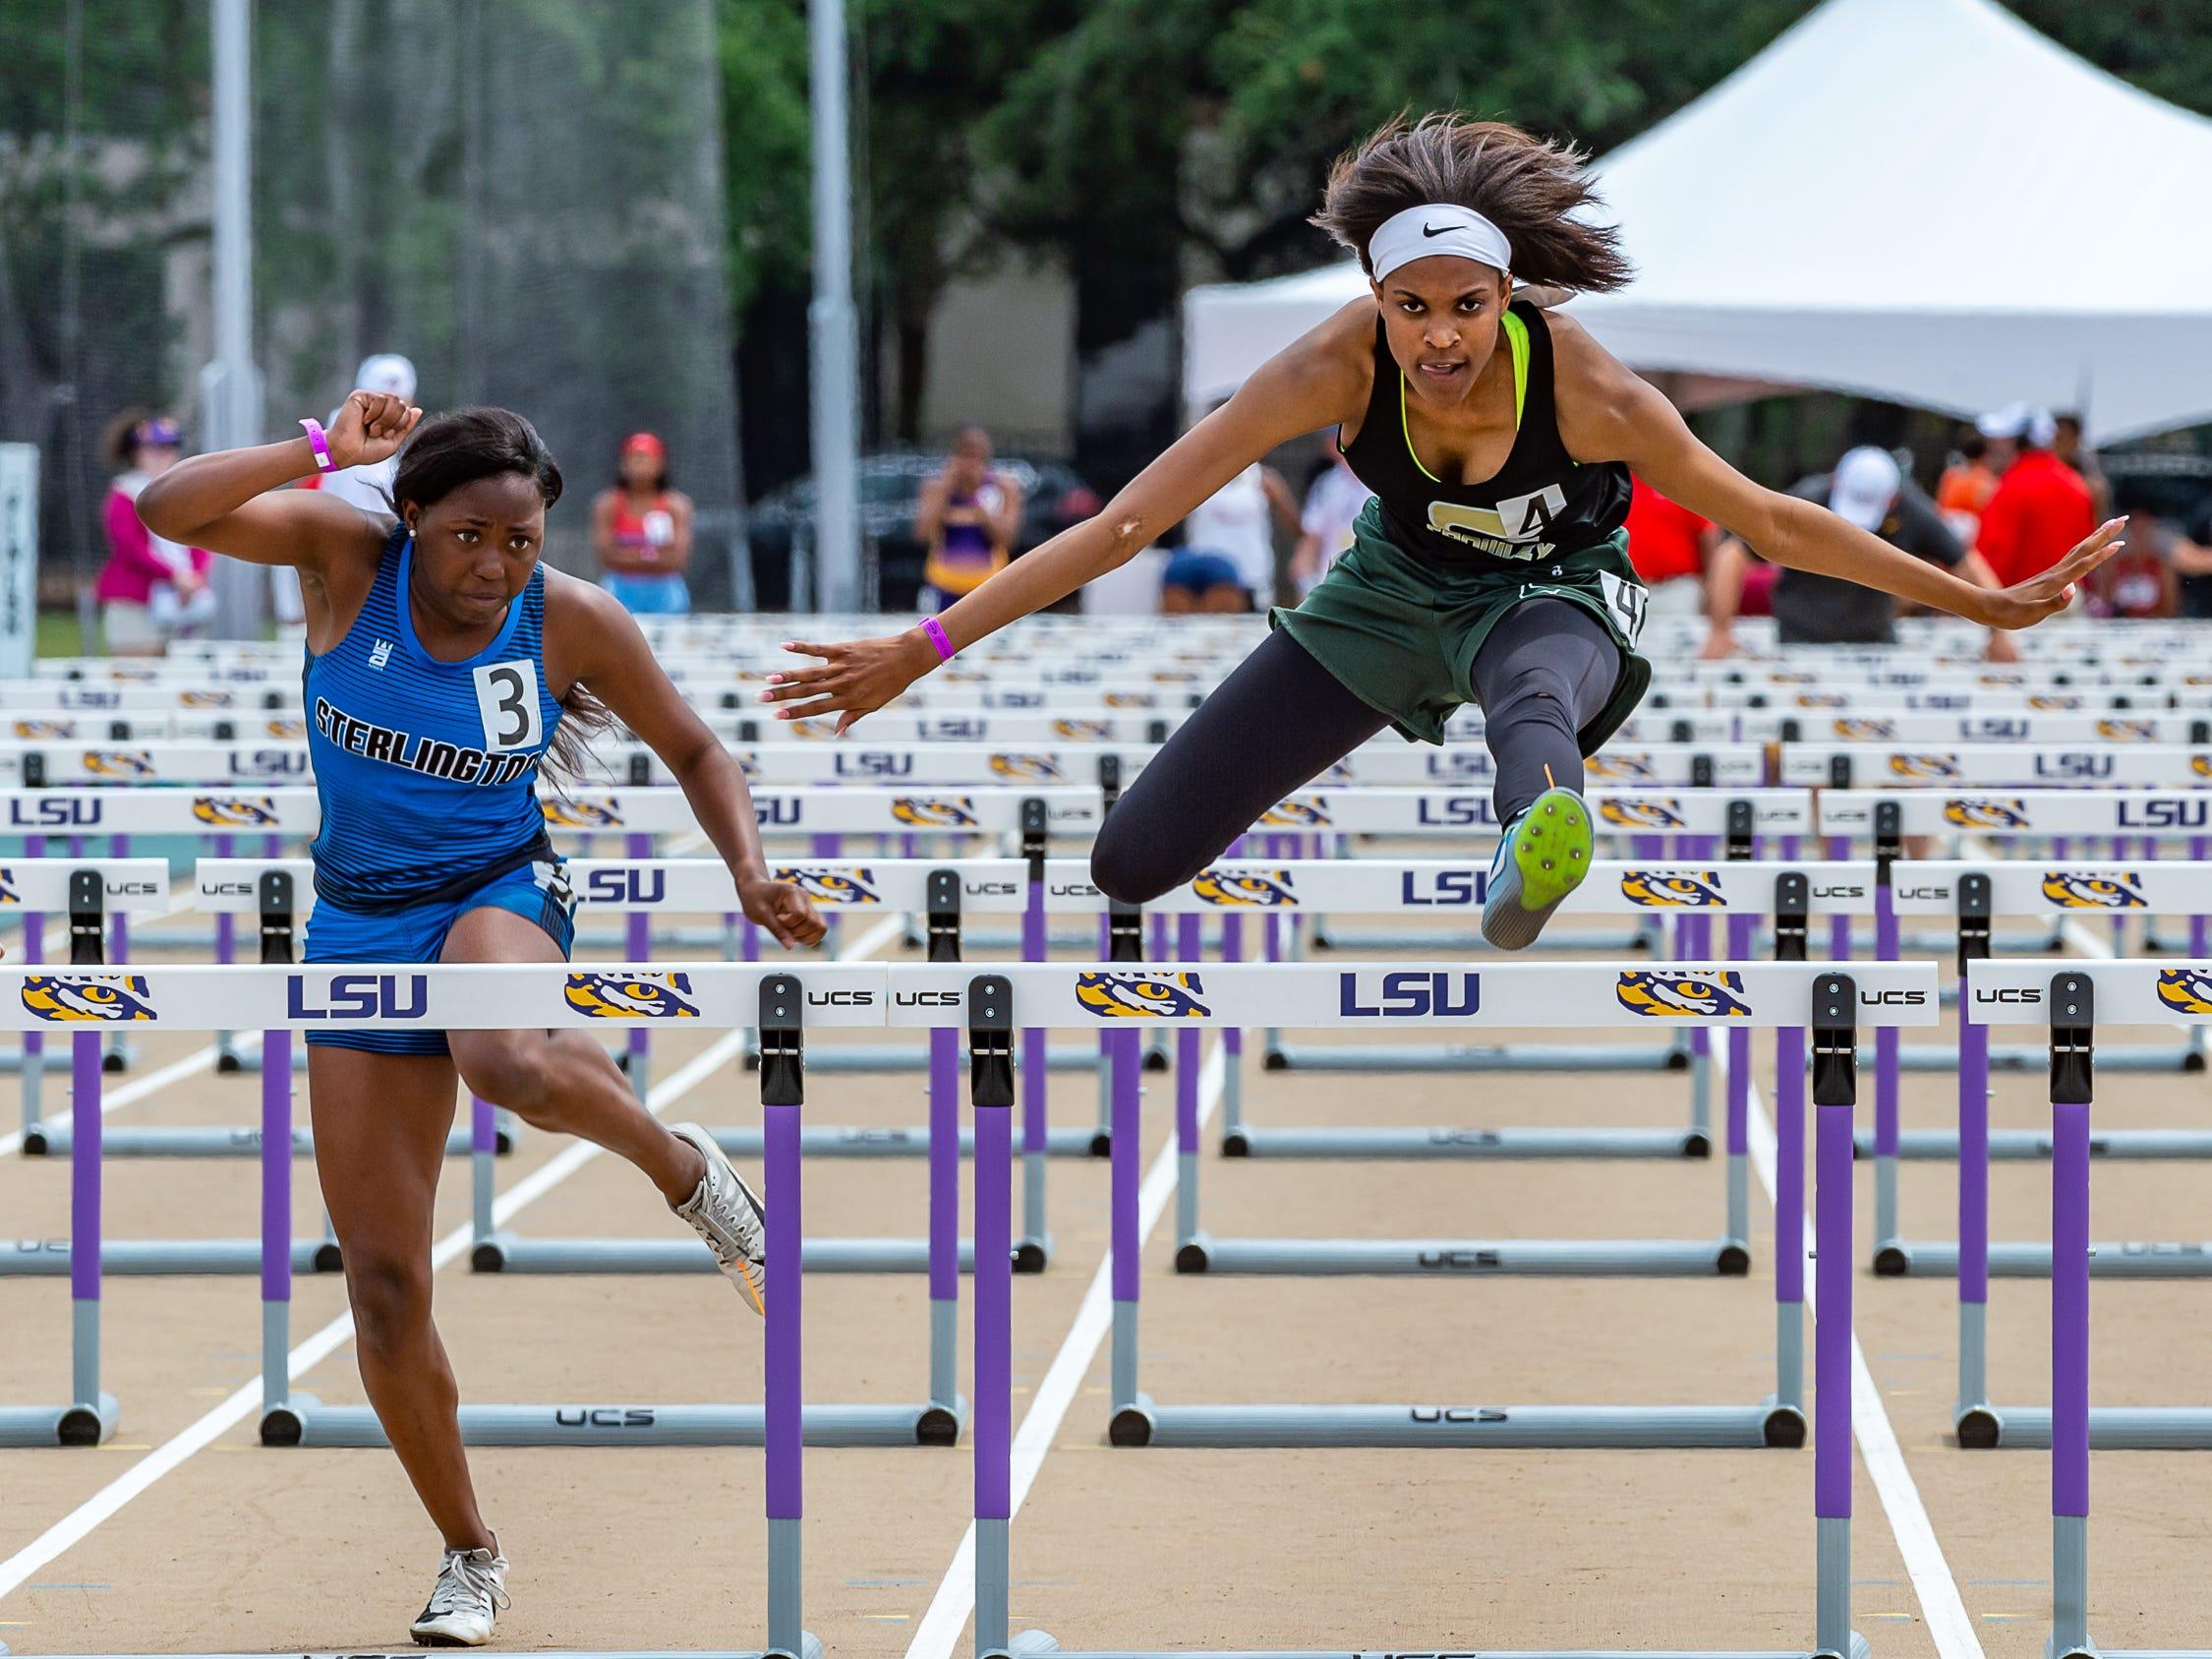 Crowleys Ajah Kneeland competes in the girls 100 m hurdlesThe LHSAA Sate Track Meet at Bernie Moore Track in Baton Rouge, LA. Saturday, May 4, 2019.